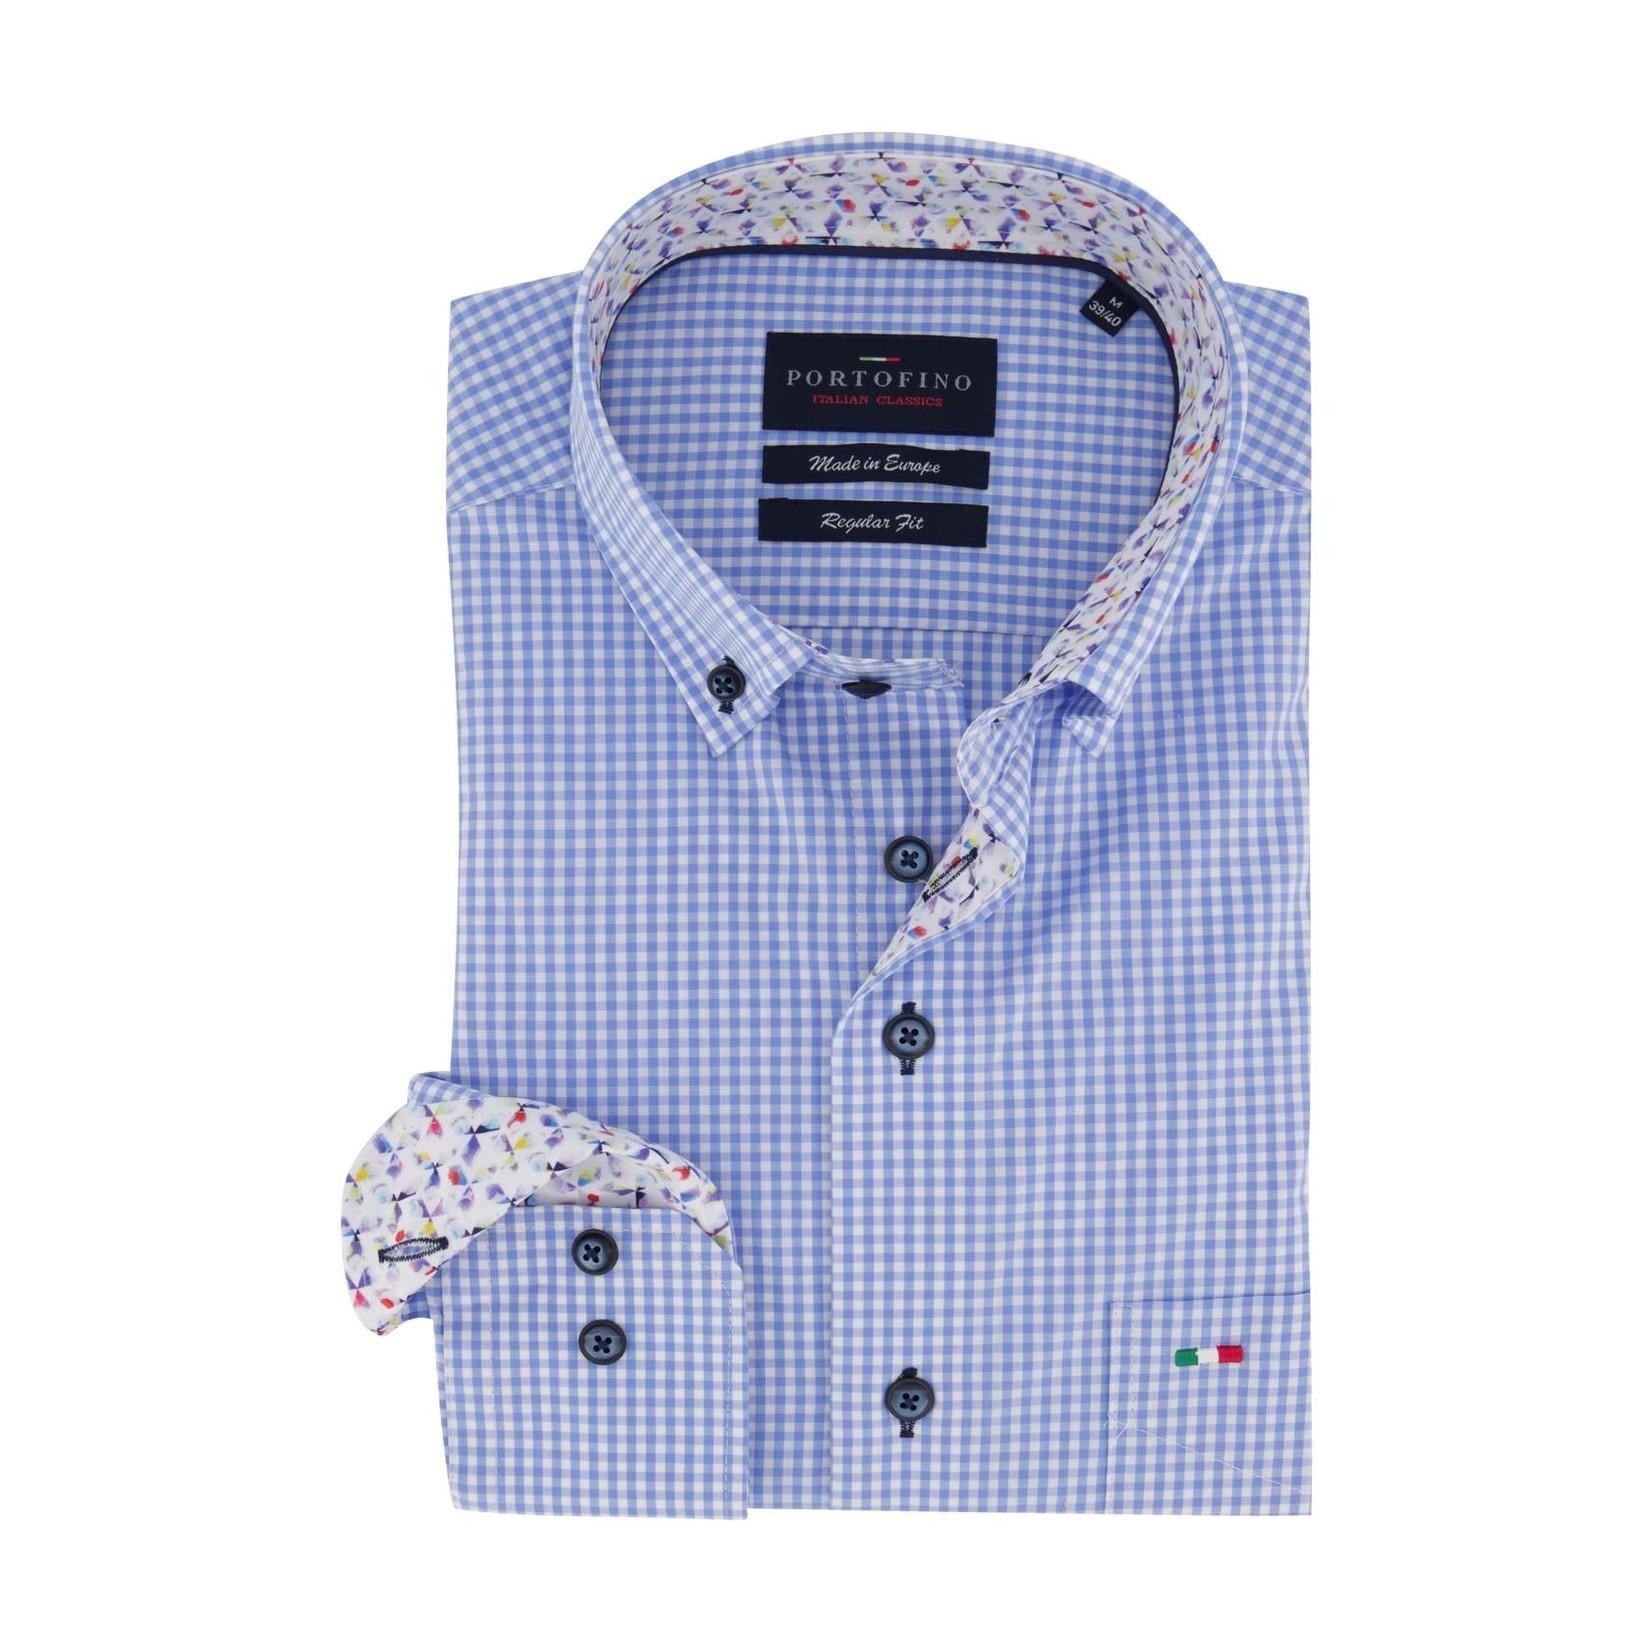 Portofino overhemd regular fit blauw ruitje